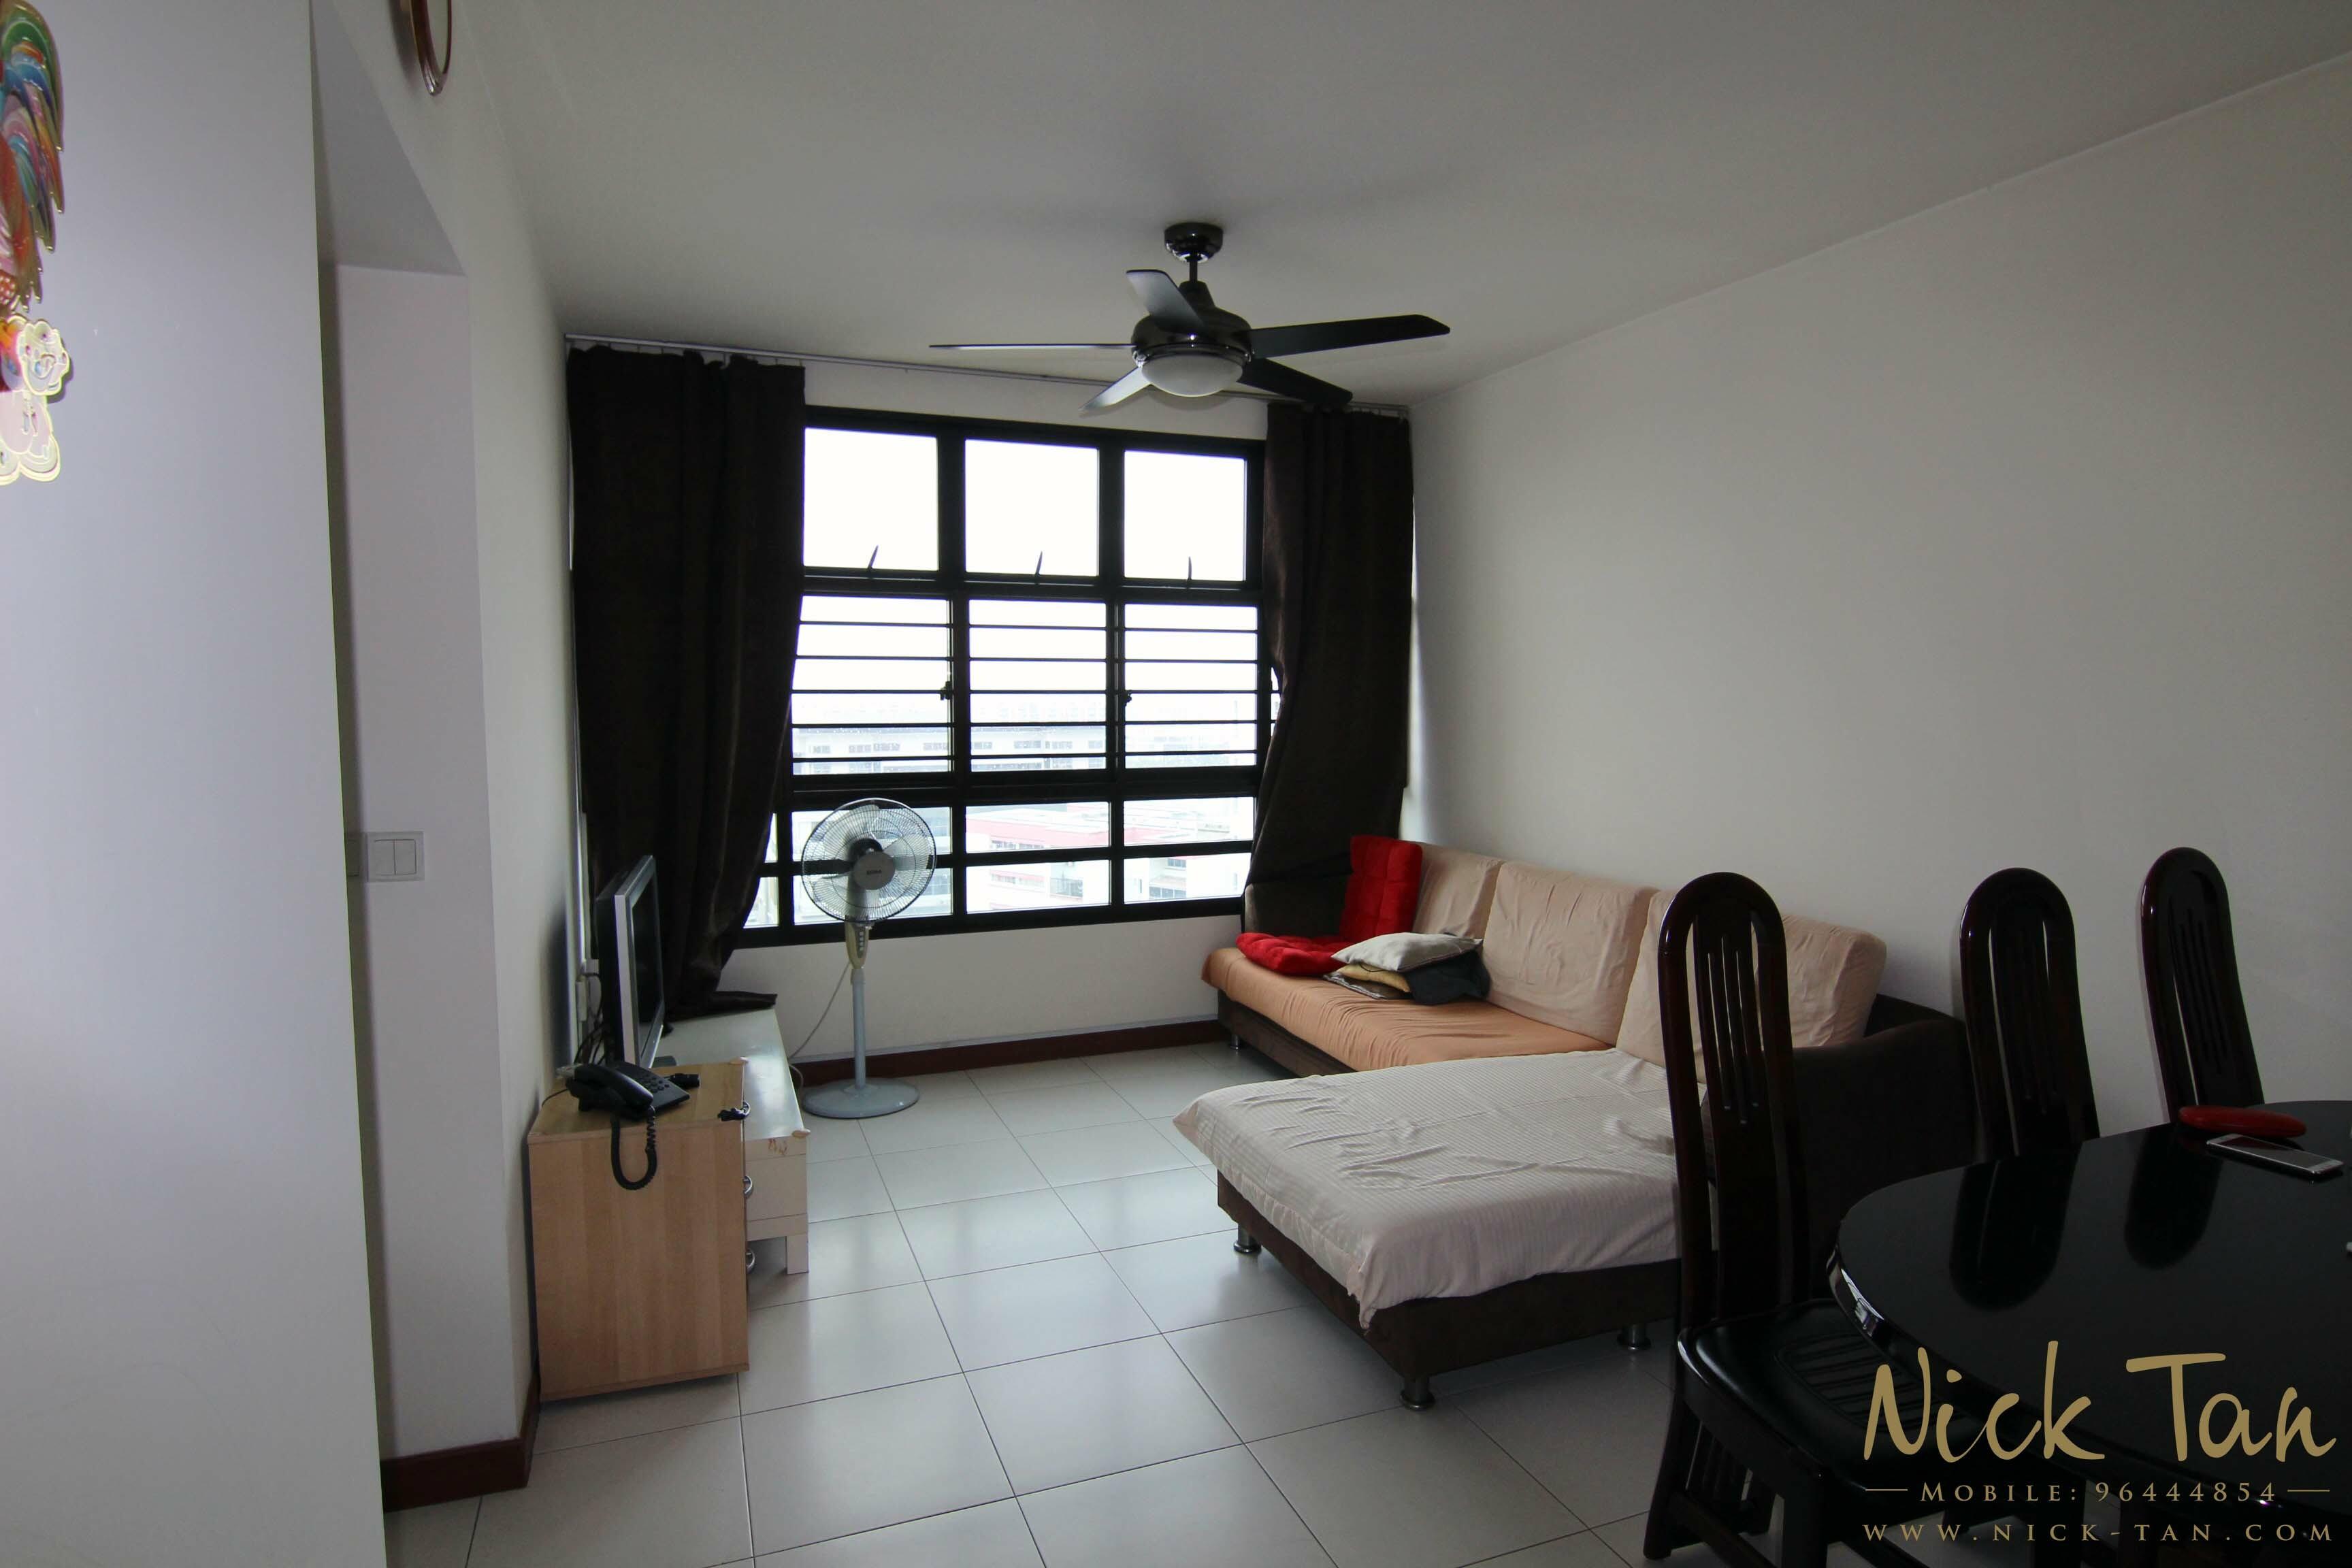 2b geylang serai 2b geylang serai 3 bedrooms 1022 sqft hdb flats for rent by nick tan s Master bedroom for rent in geylang